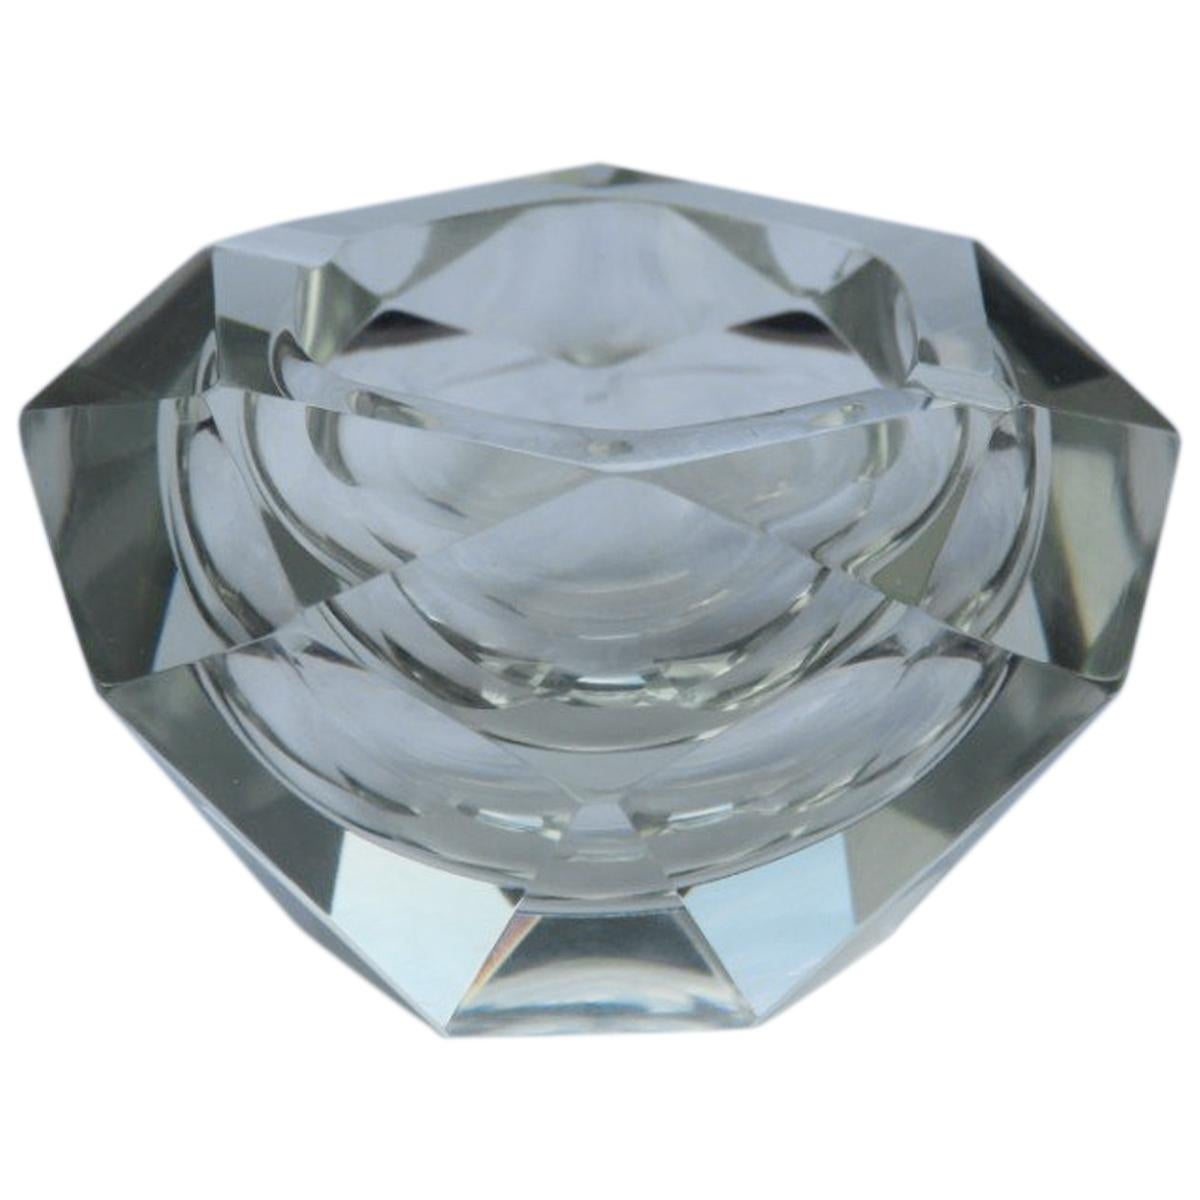 Diamond Shaped Ashtray Shining Italy Design 1960s Transparent Glass